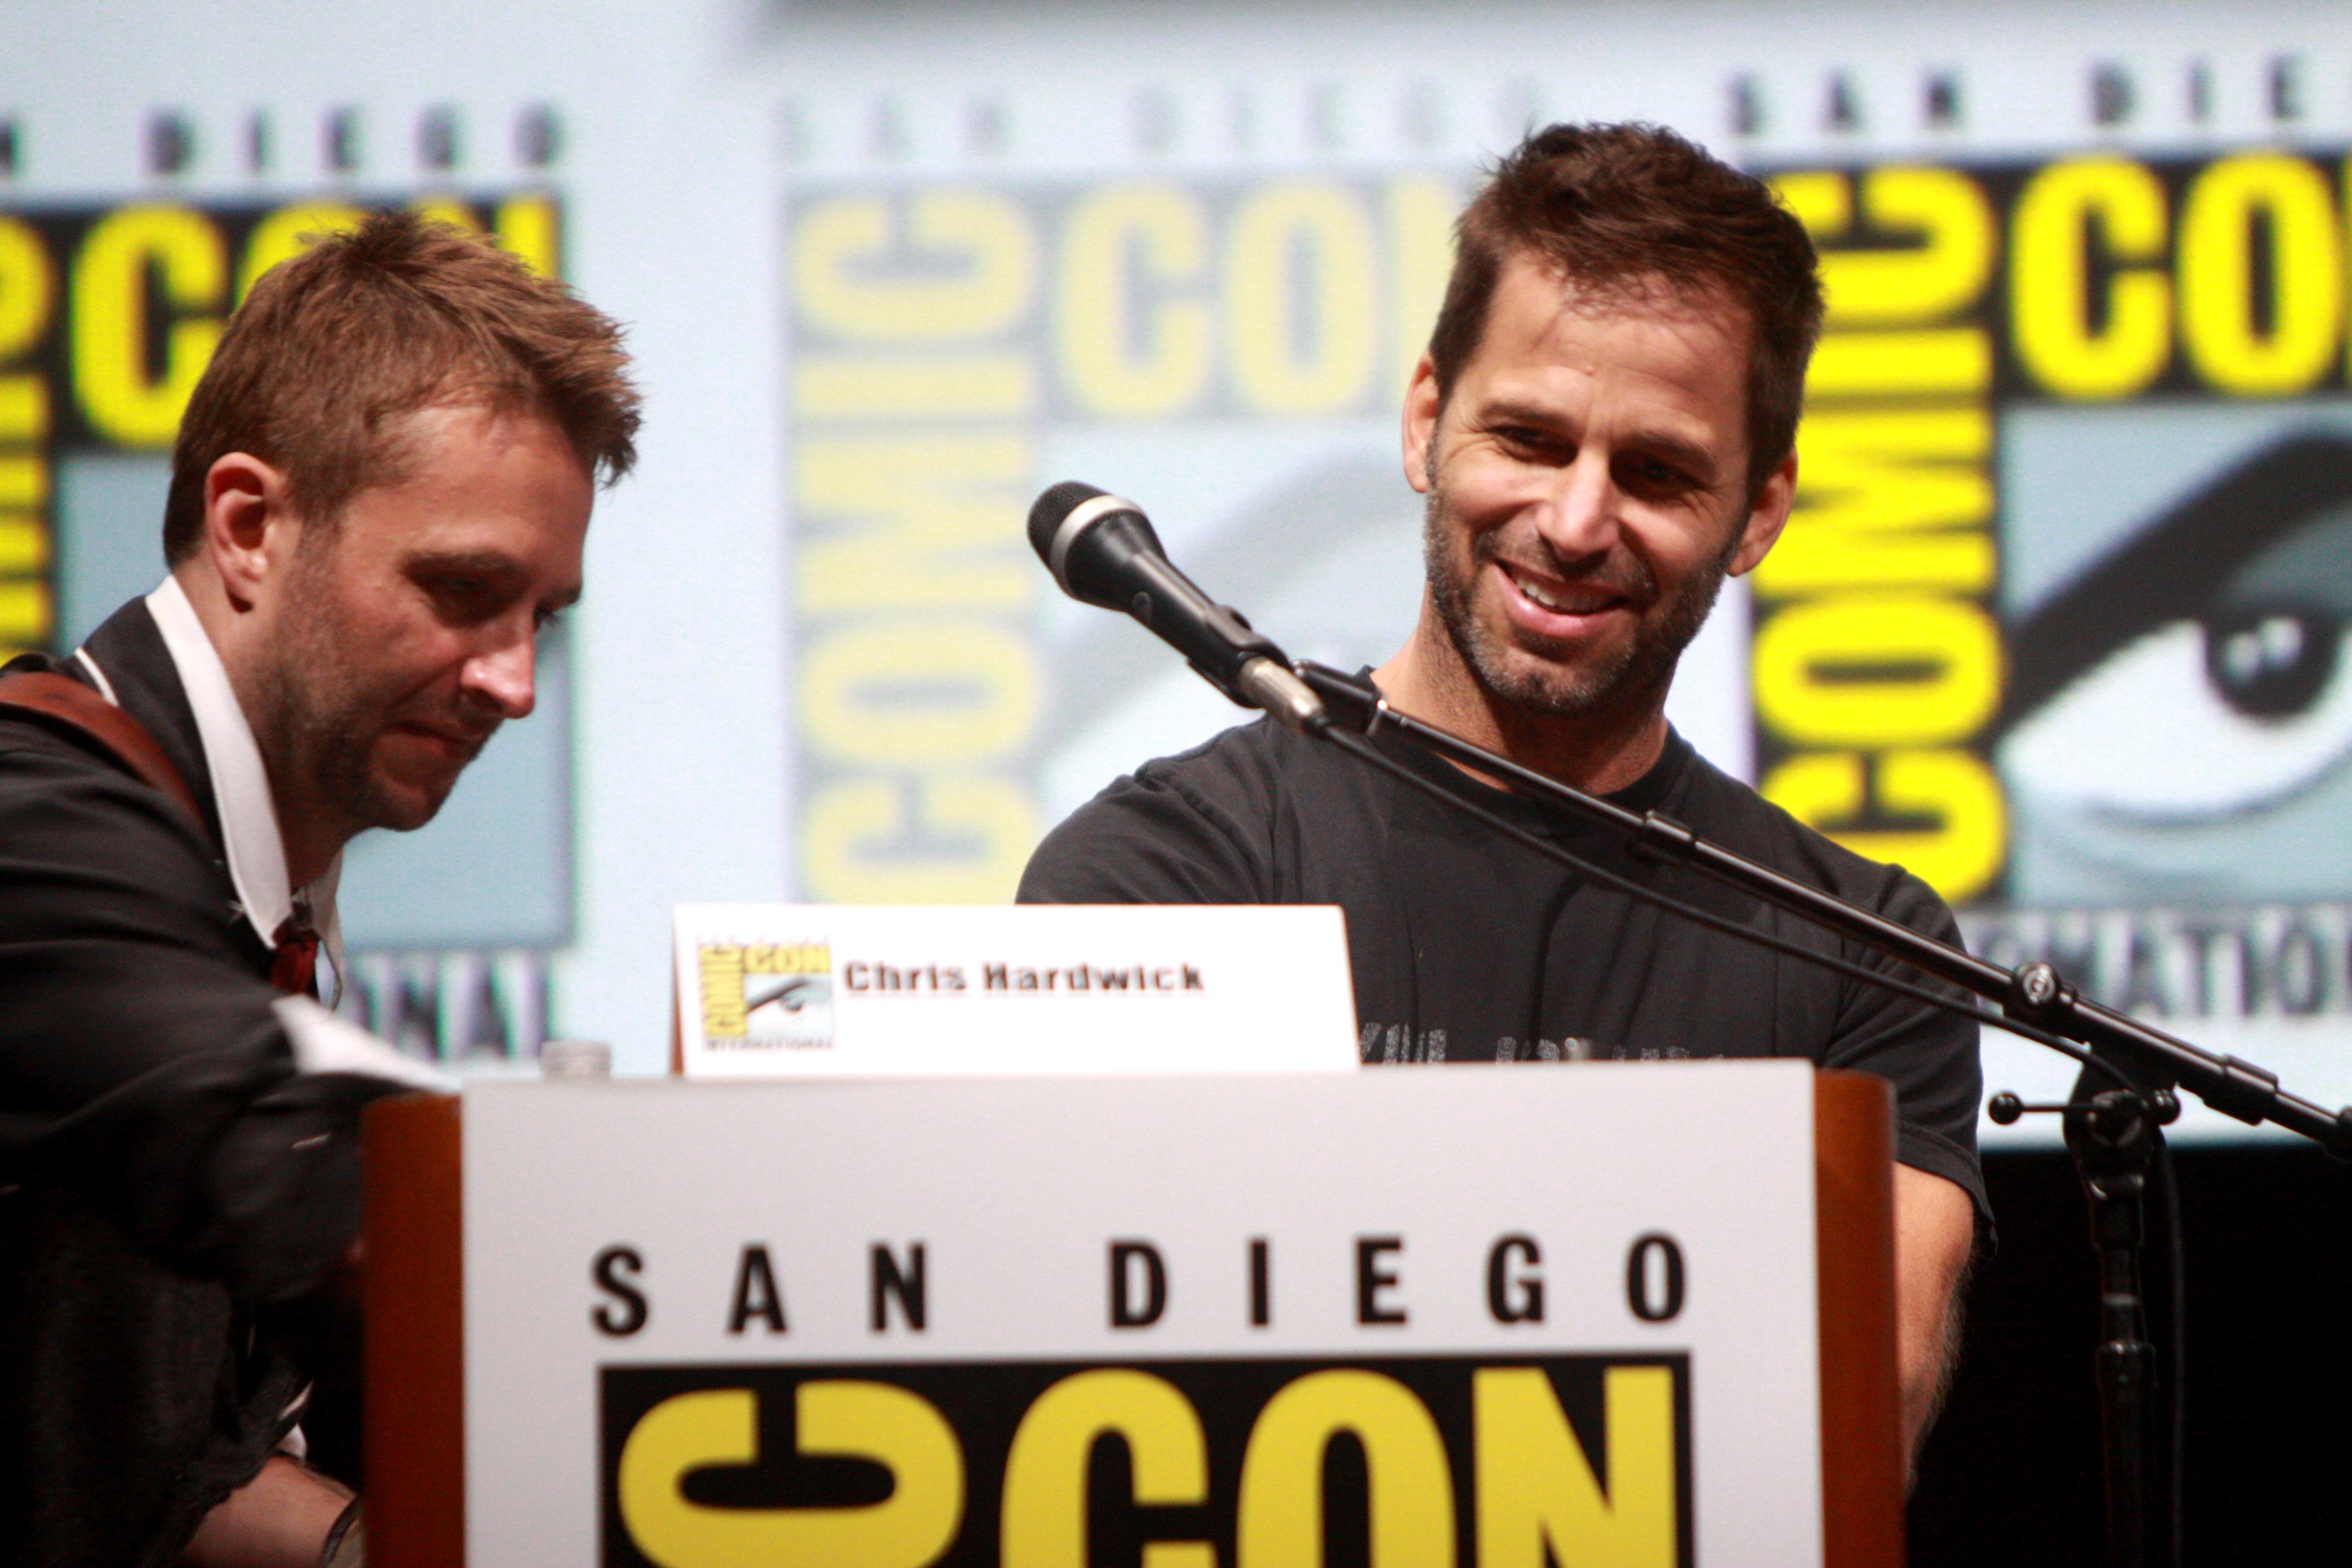 Chris Hardwick & Zack Snyder